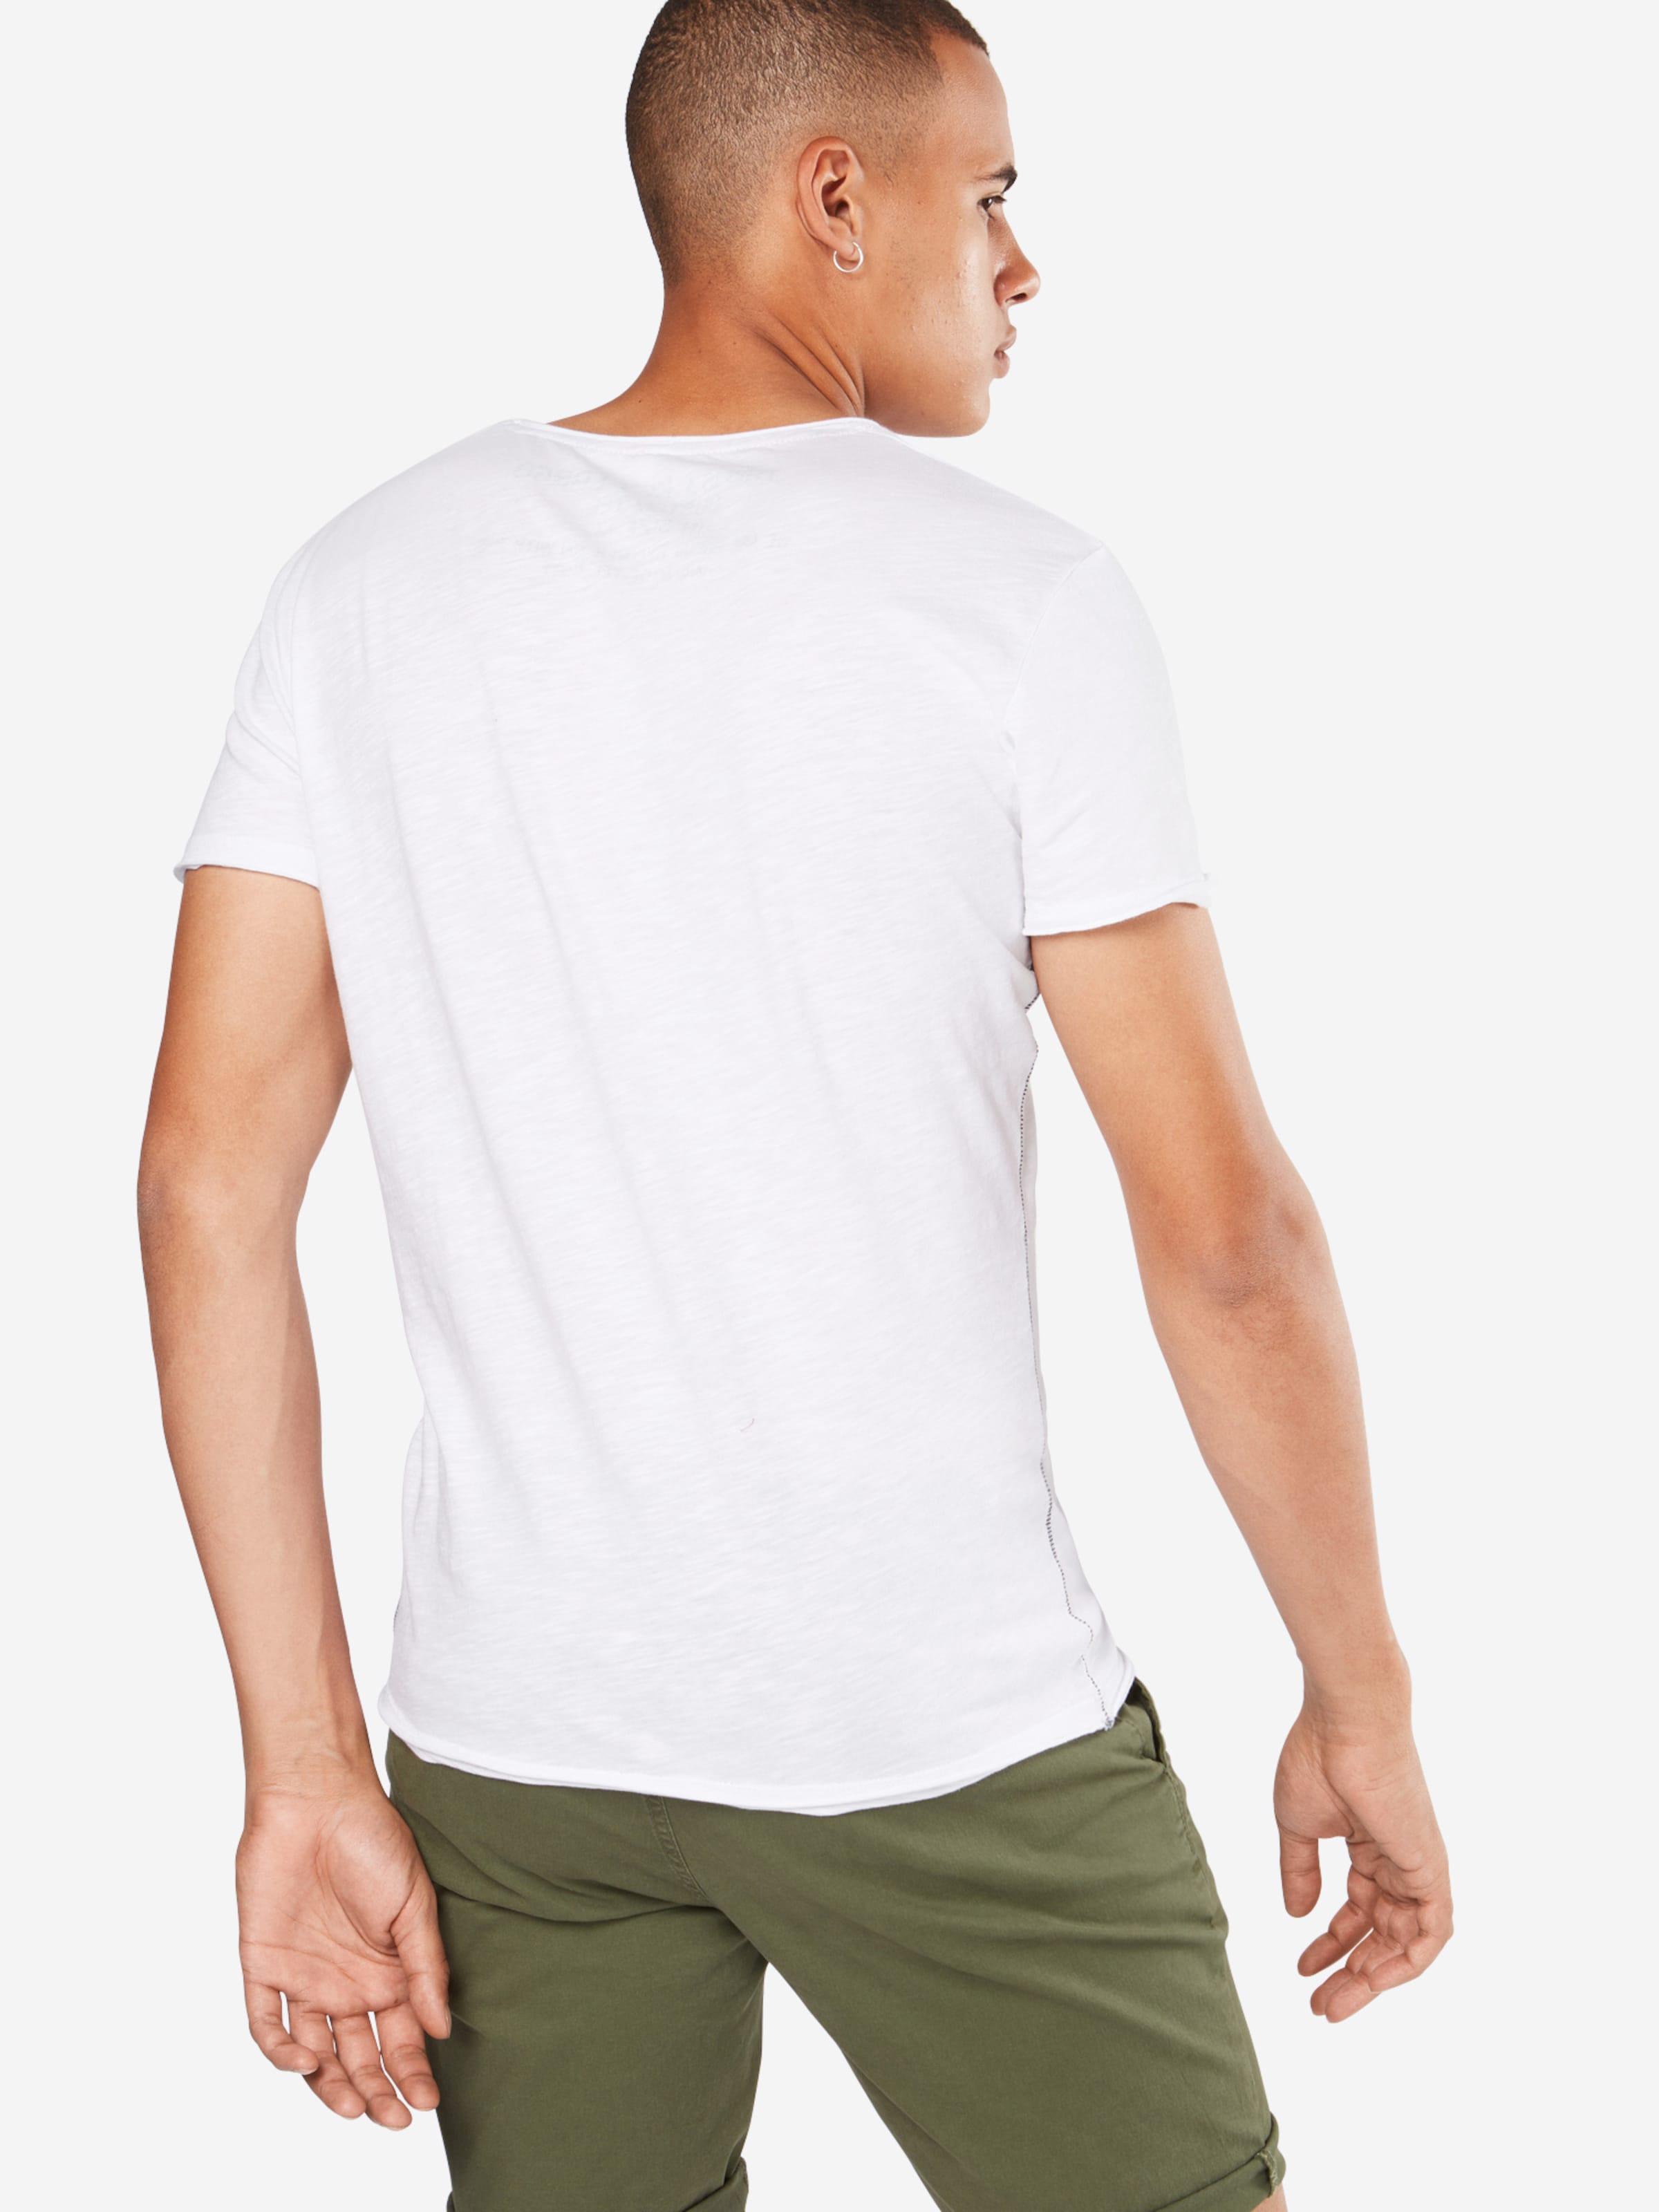 Key V Buddha T shirt 'mt Largo En neck' GrisBlanc jMpqVLzUGS